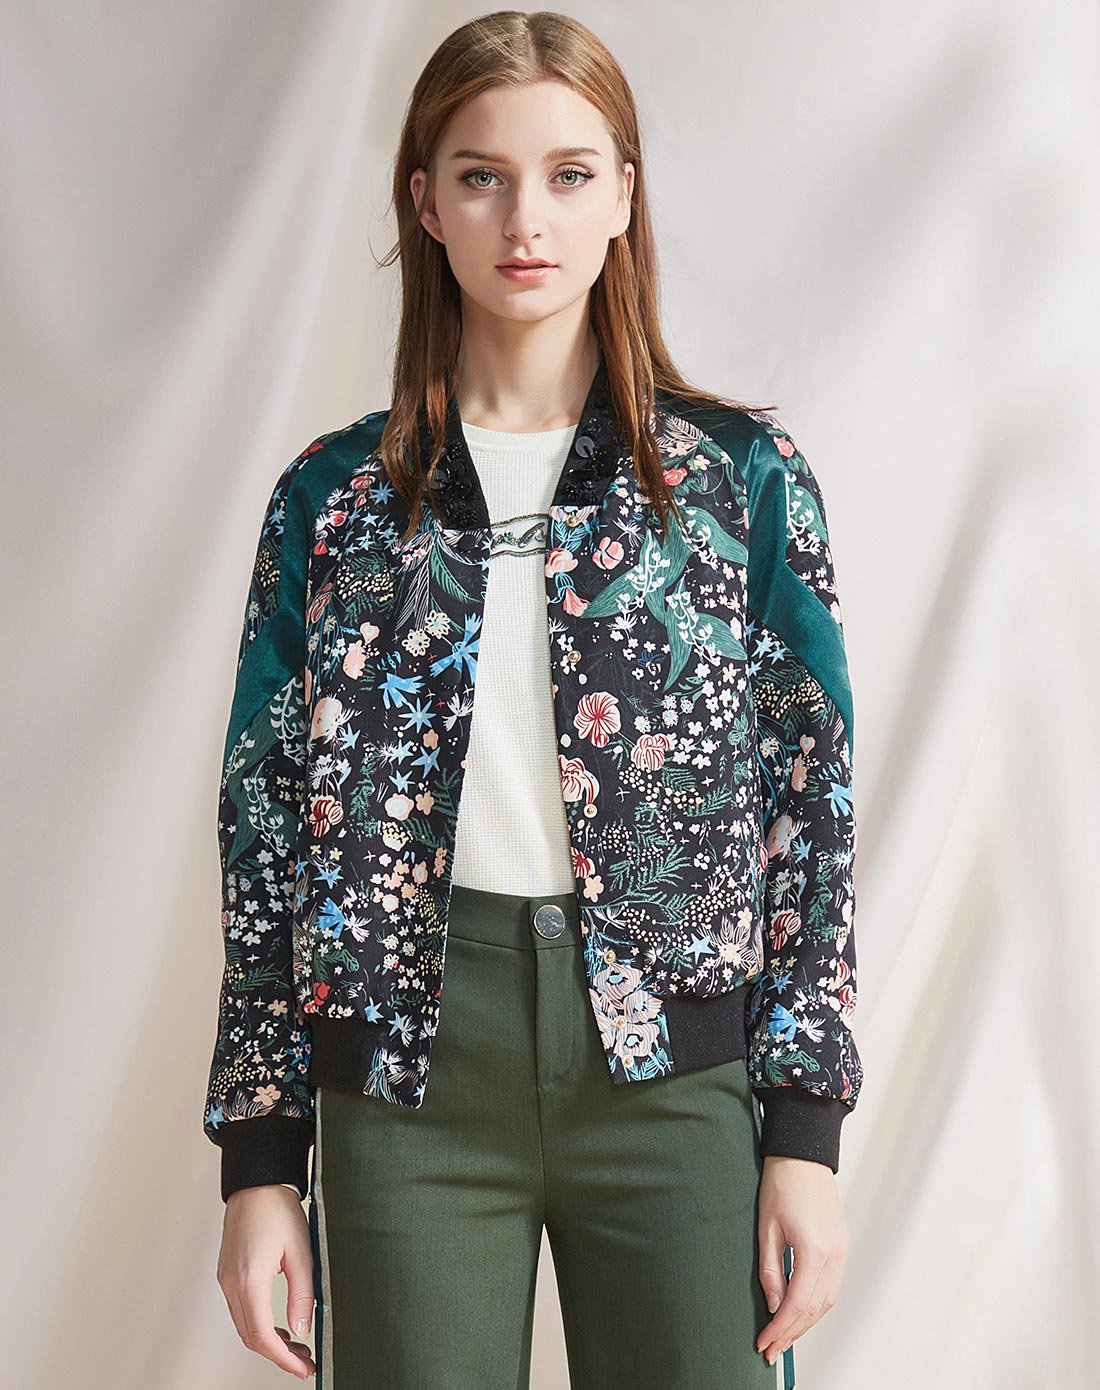 XGXG雪歌春季时尚立领钉珠短外套女 印花拼接夹克XE107002B106